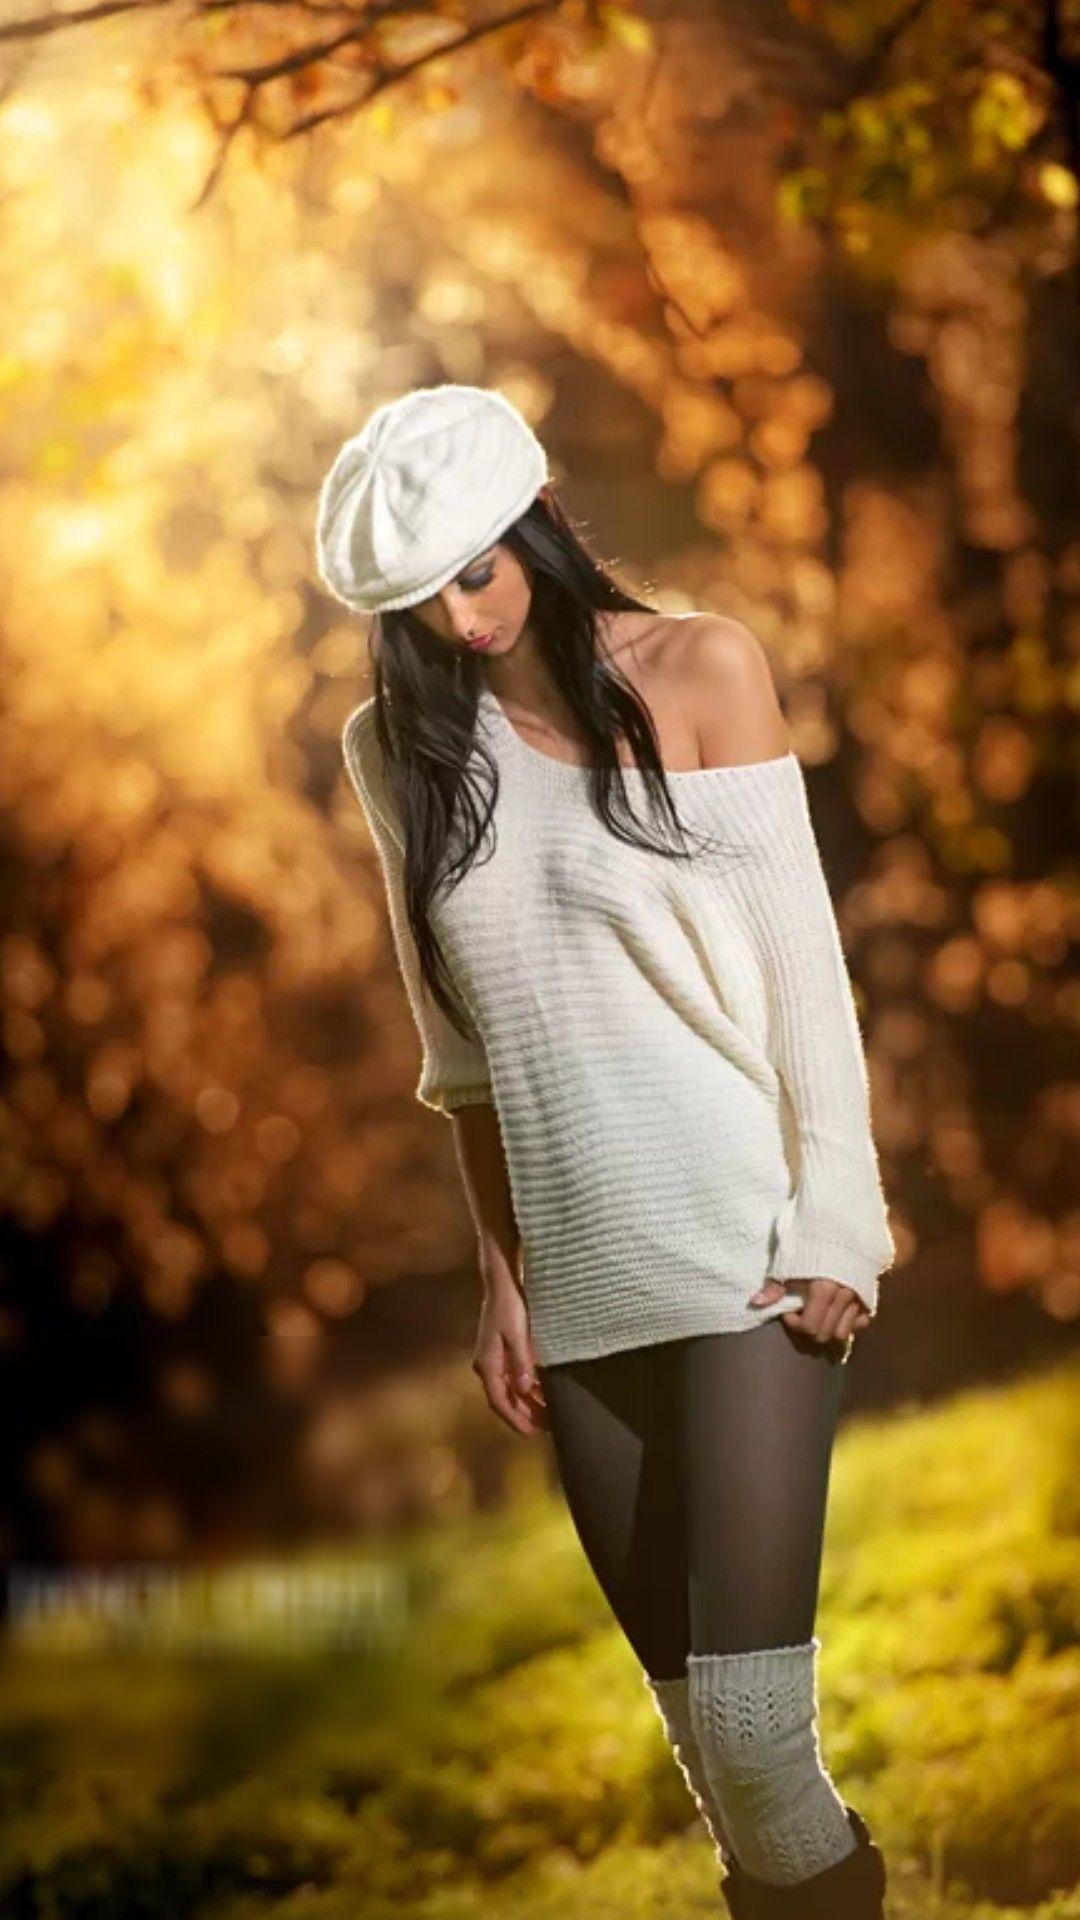 Pin by george beredjiklian on nature | Girl fashion, Fall